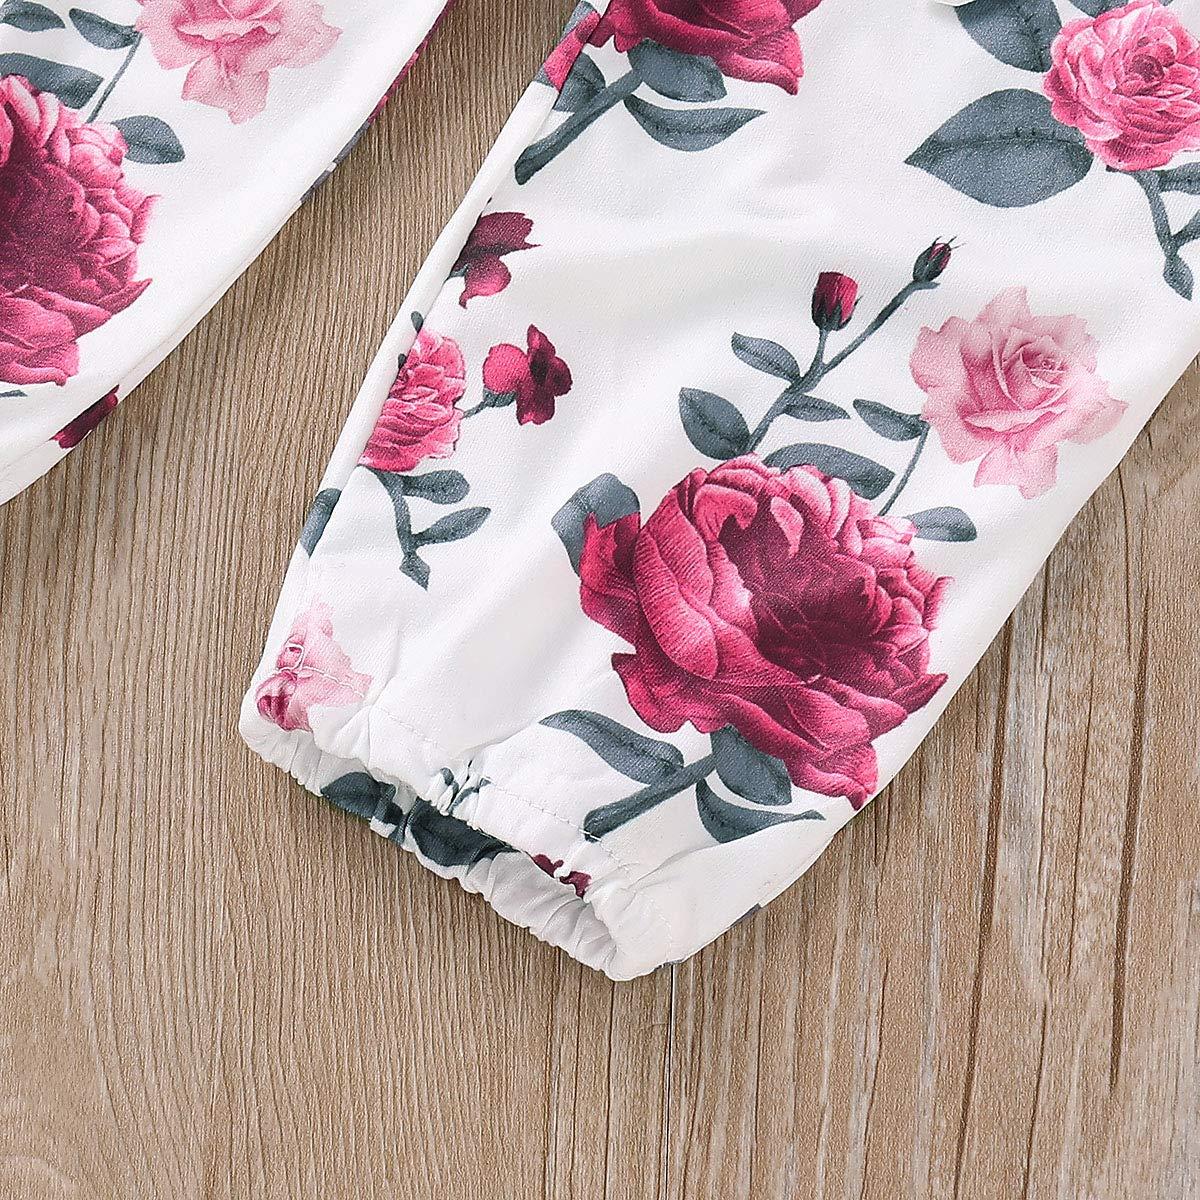 Floral Pants Bow-Knot Headband Yaffi 3 Pieces Toddler Baby Girls Bodysuit Set Ruffle Crimson Romper